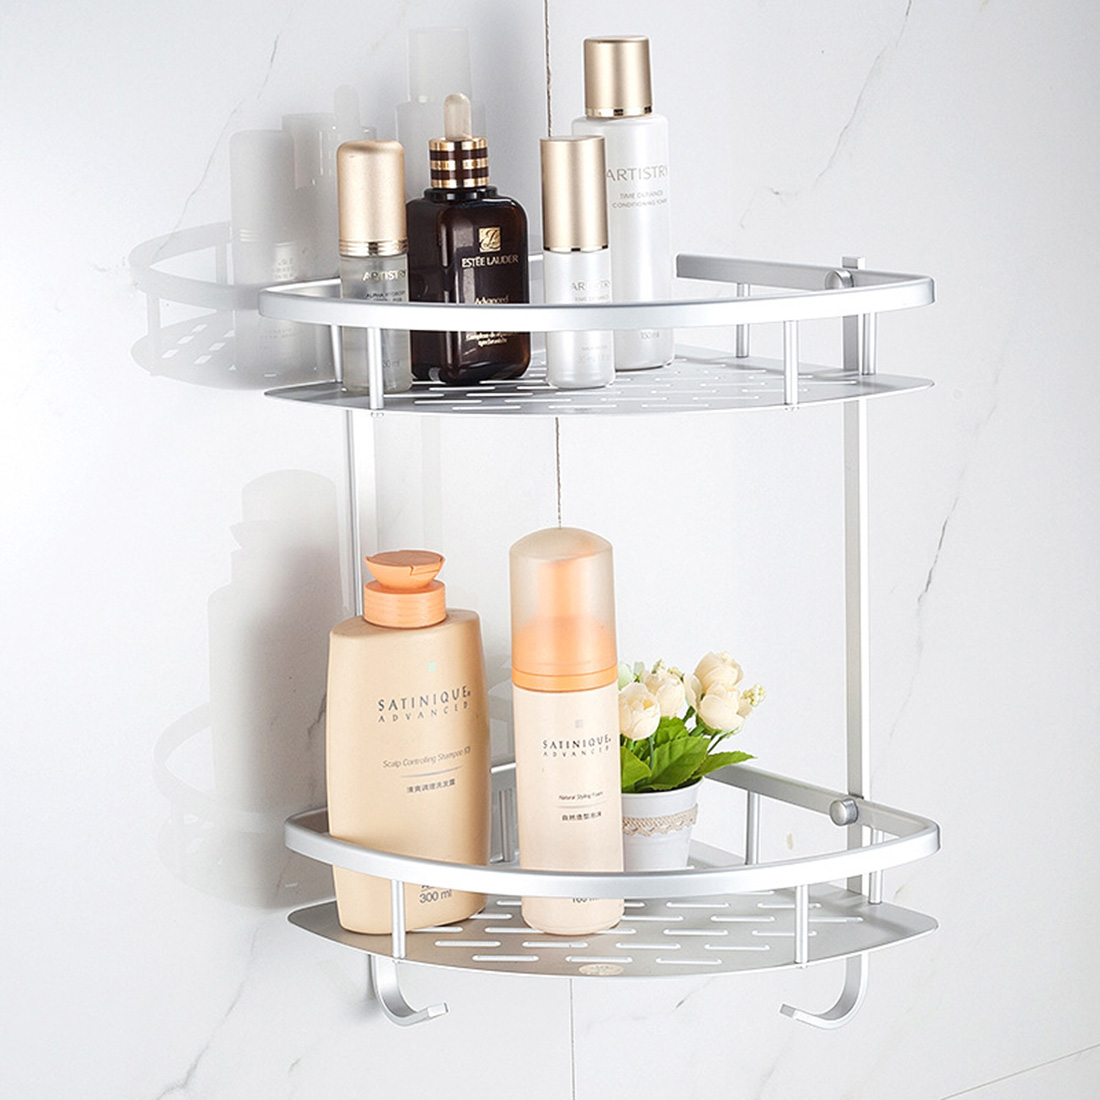 Space Aluminum Bathroom Shelf Shower Shampoo Soap Cosmetic Shelves Bathroom Accessories Storage